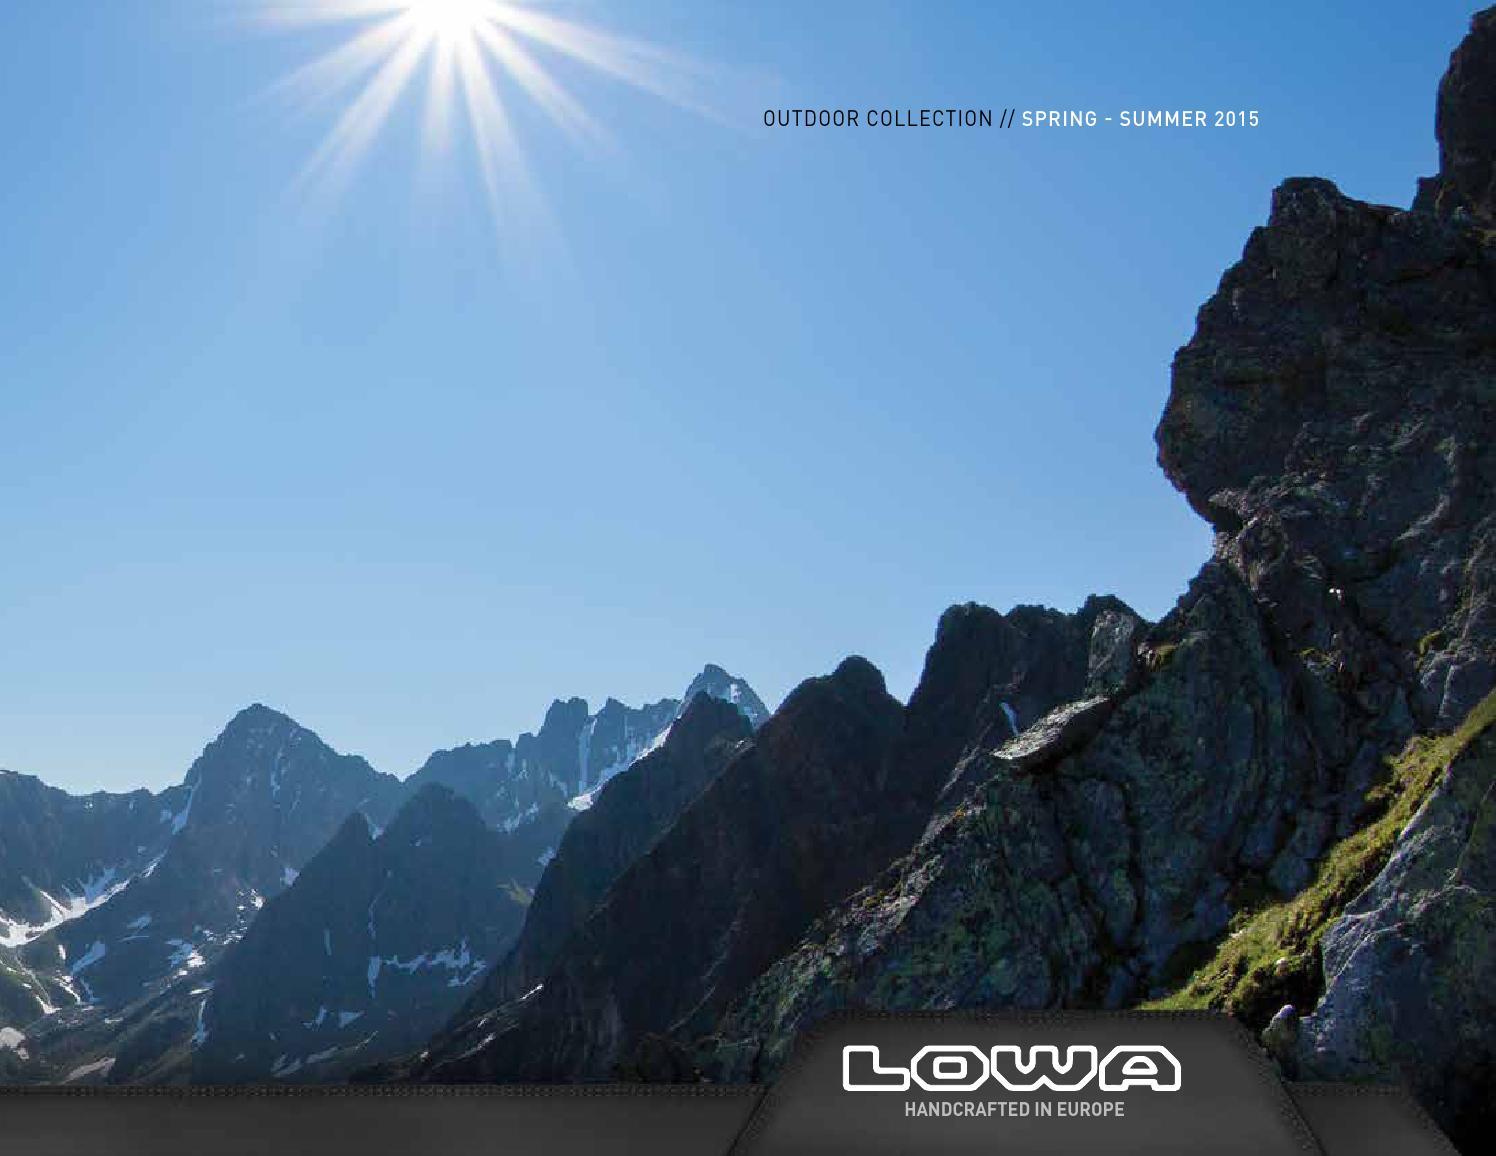 249debe54a0 Lowa catalog spring 2015 by SASTG - issuu